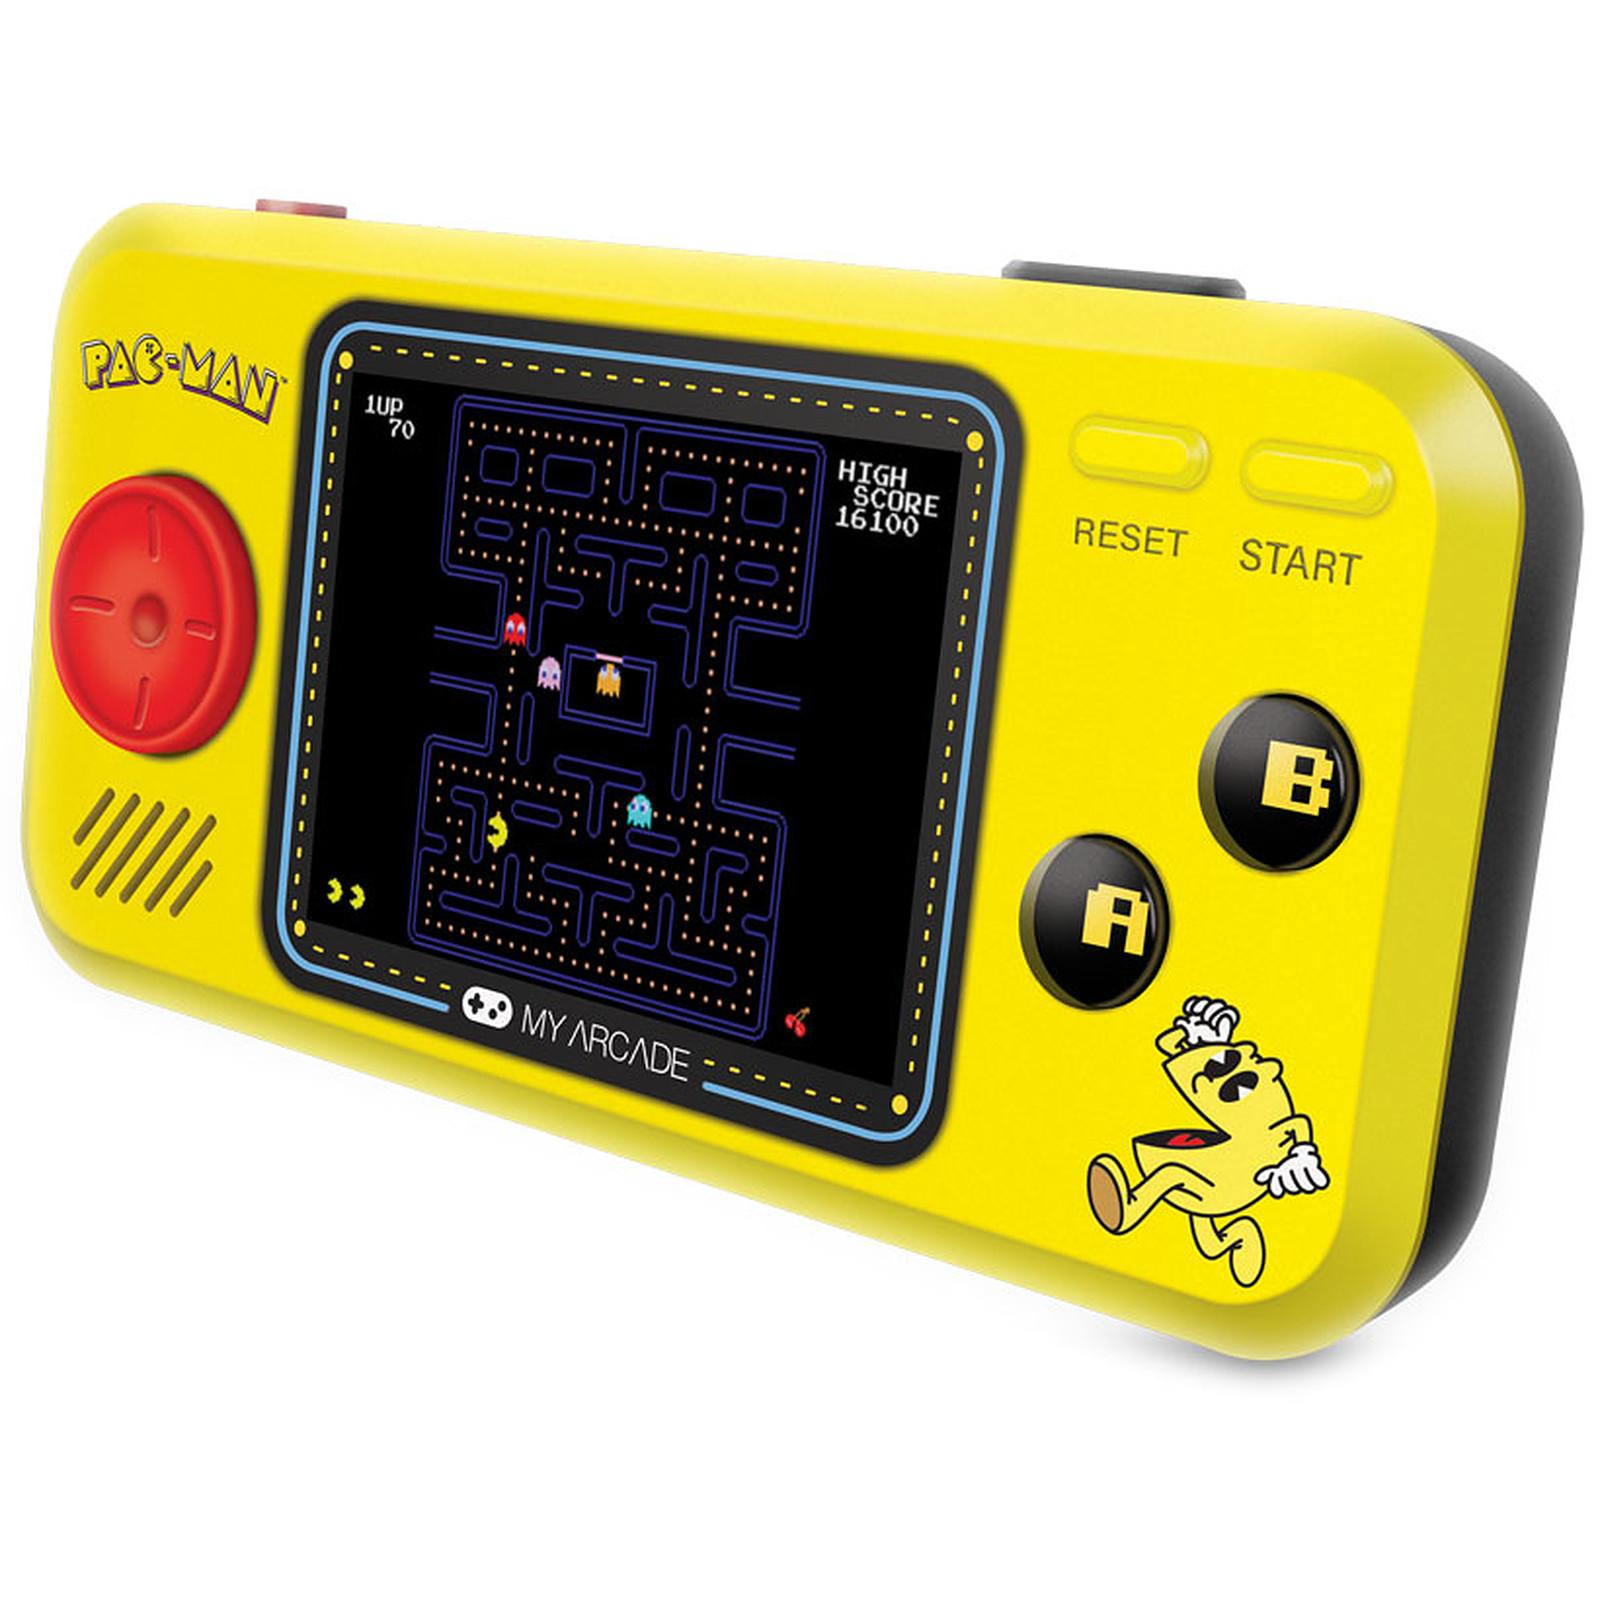 My Arcade PAC-MAN Pocket Player